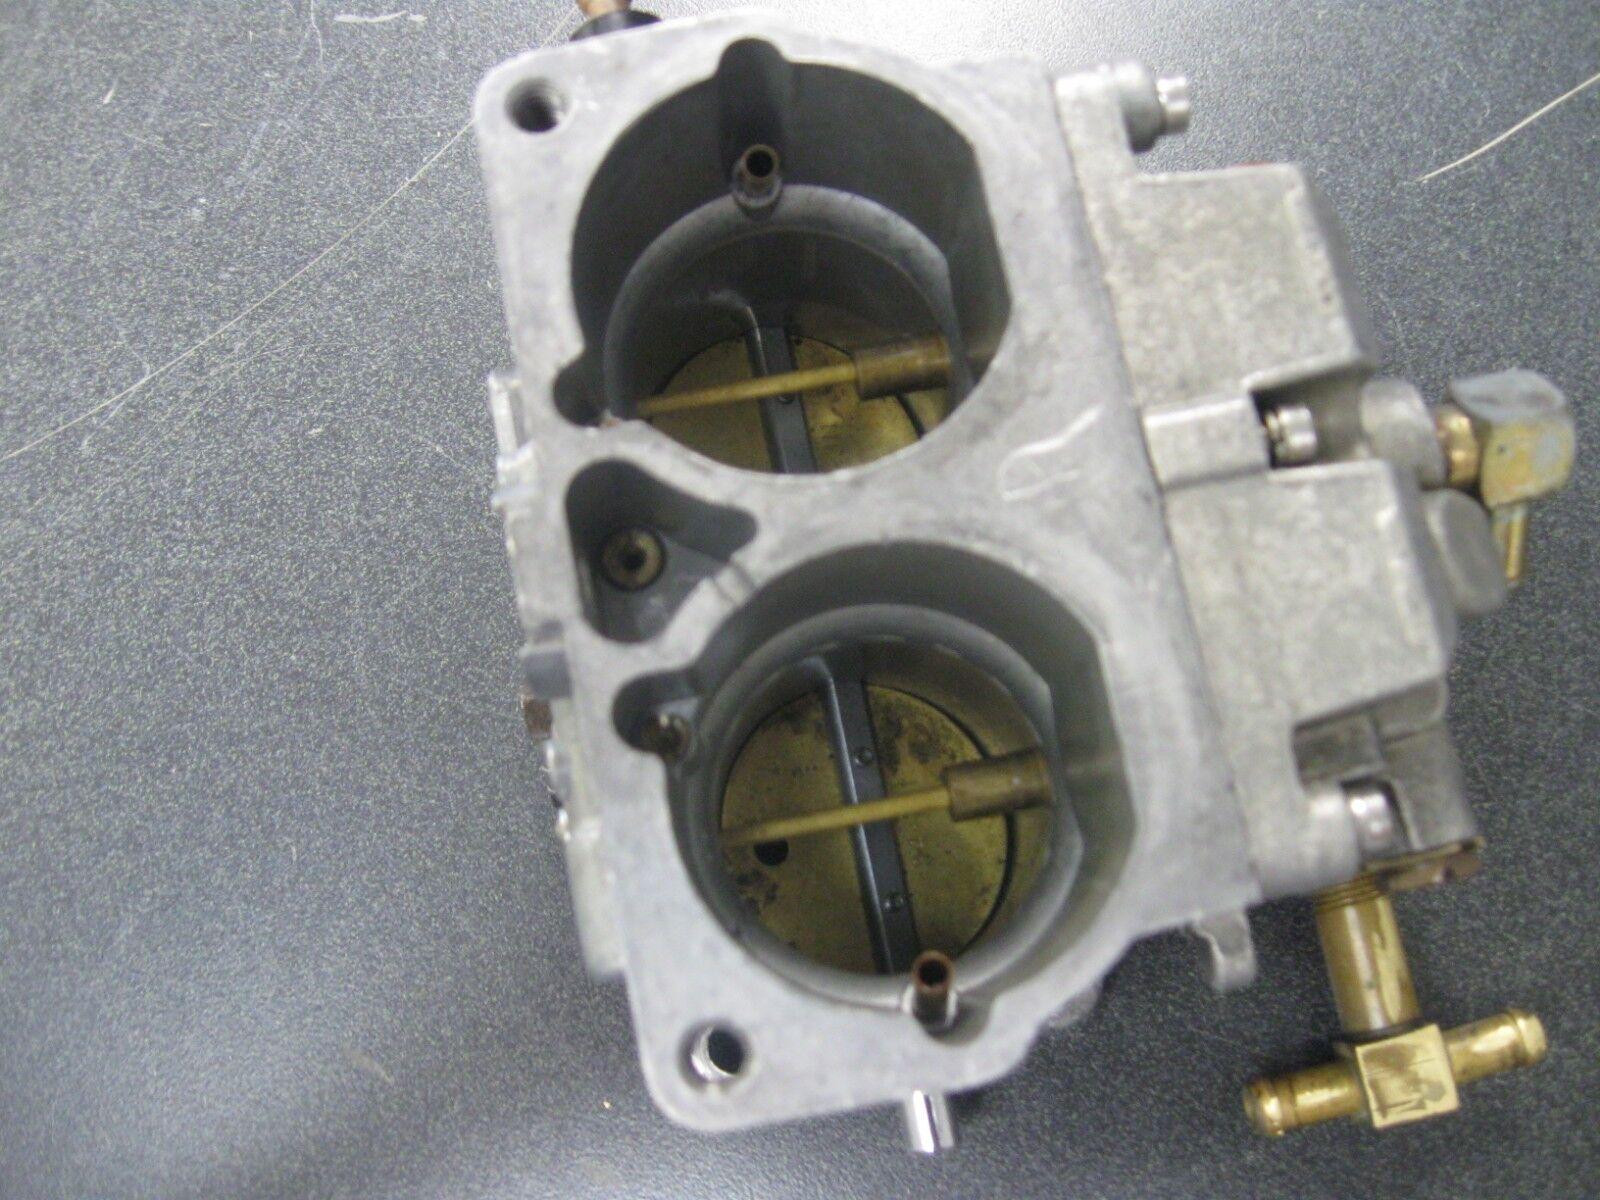 Mercury Außenborder Außenborder Außenborder Vergaser Montage 828273a 2 610dc4